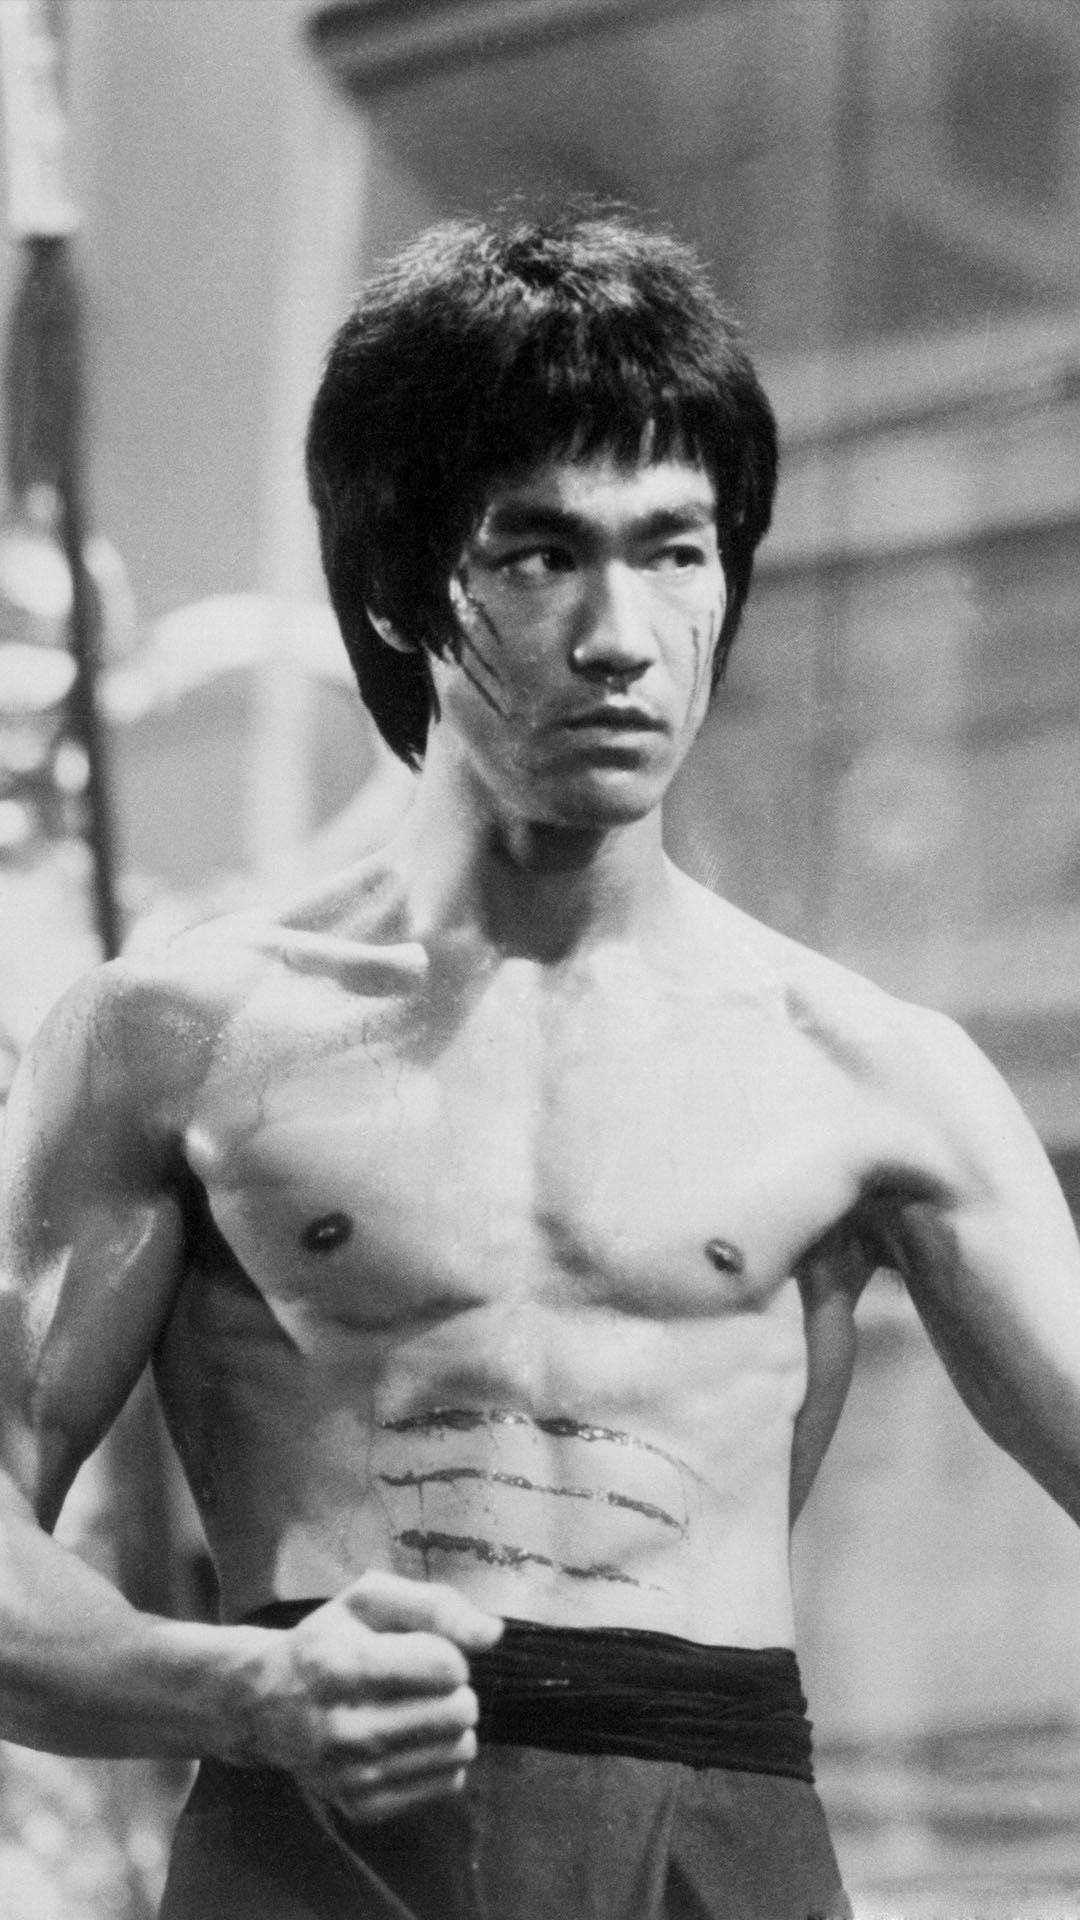 Inspirational Quotes Iphone Wallpaper Hd Bruce Lee Iphone Wallpaper Pixelstalk Net